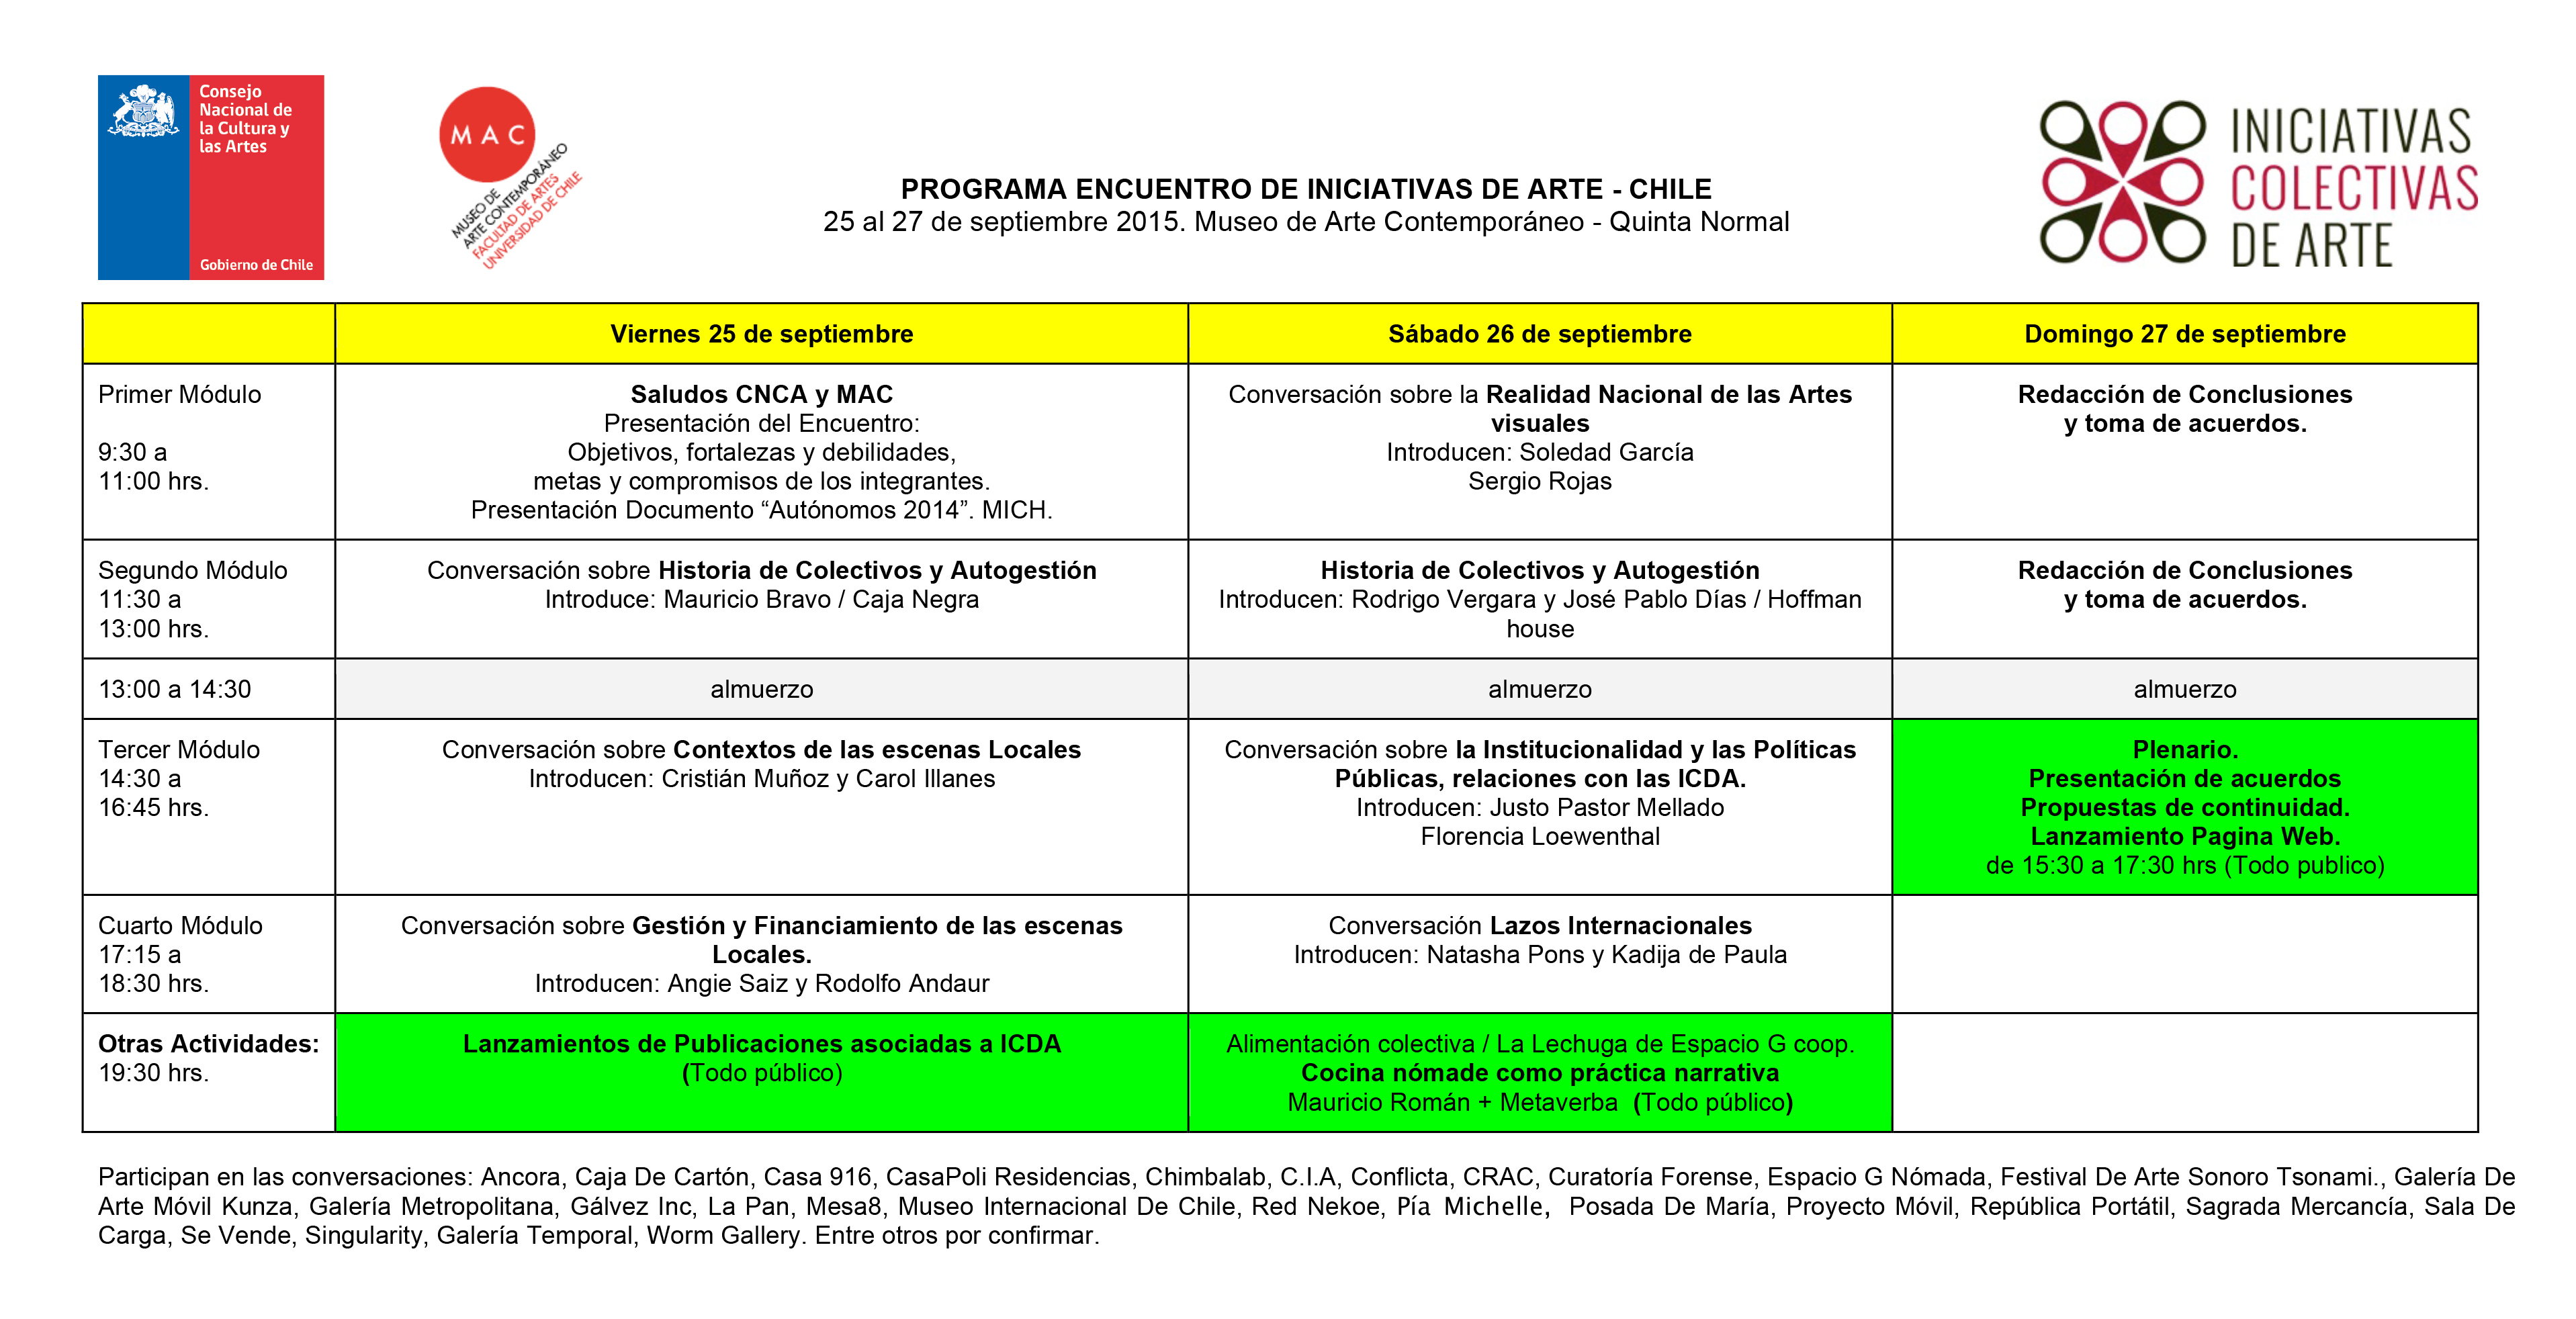 Microsoft Word - PROGRAMA ENCUENTRO ICDA 2015.docx